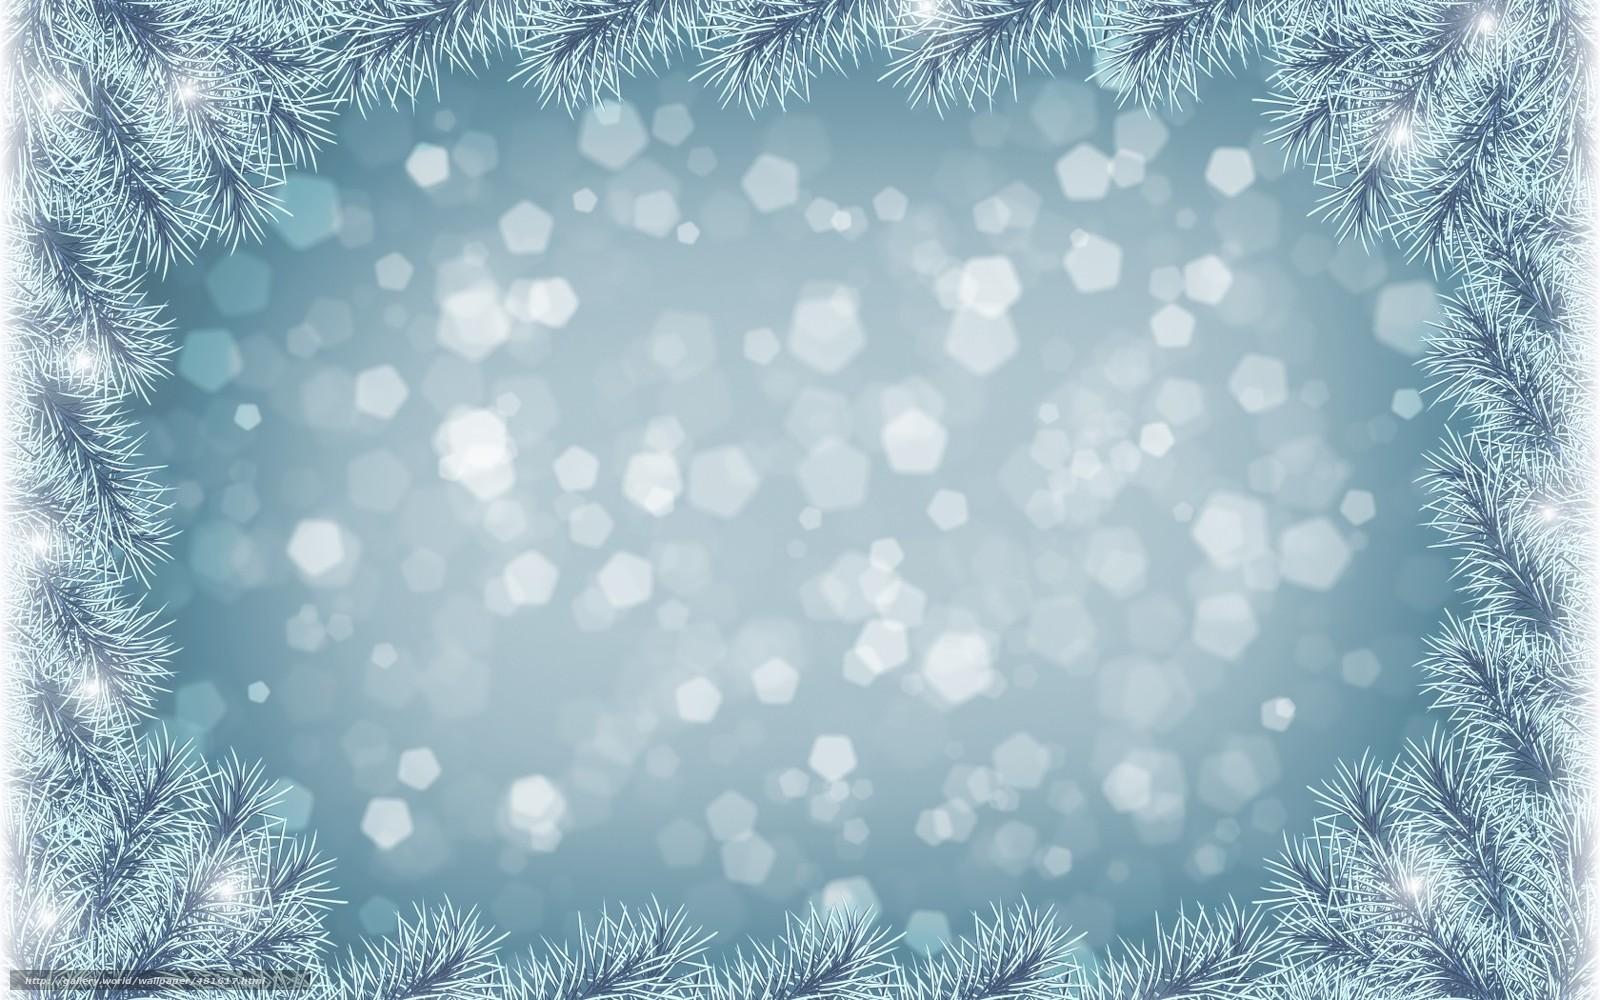 Tlcharger fond d 39 ecran sapin neige aiguilles cadre for Cadre photo fond ecran